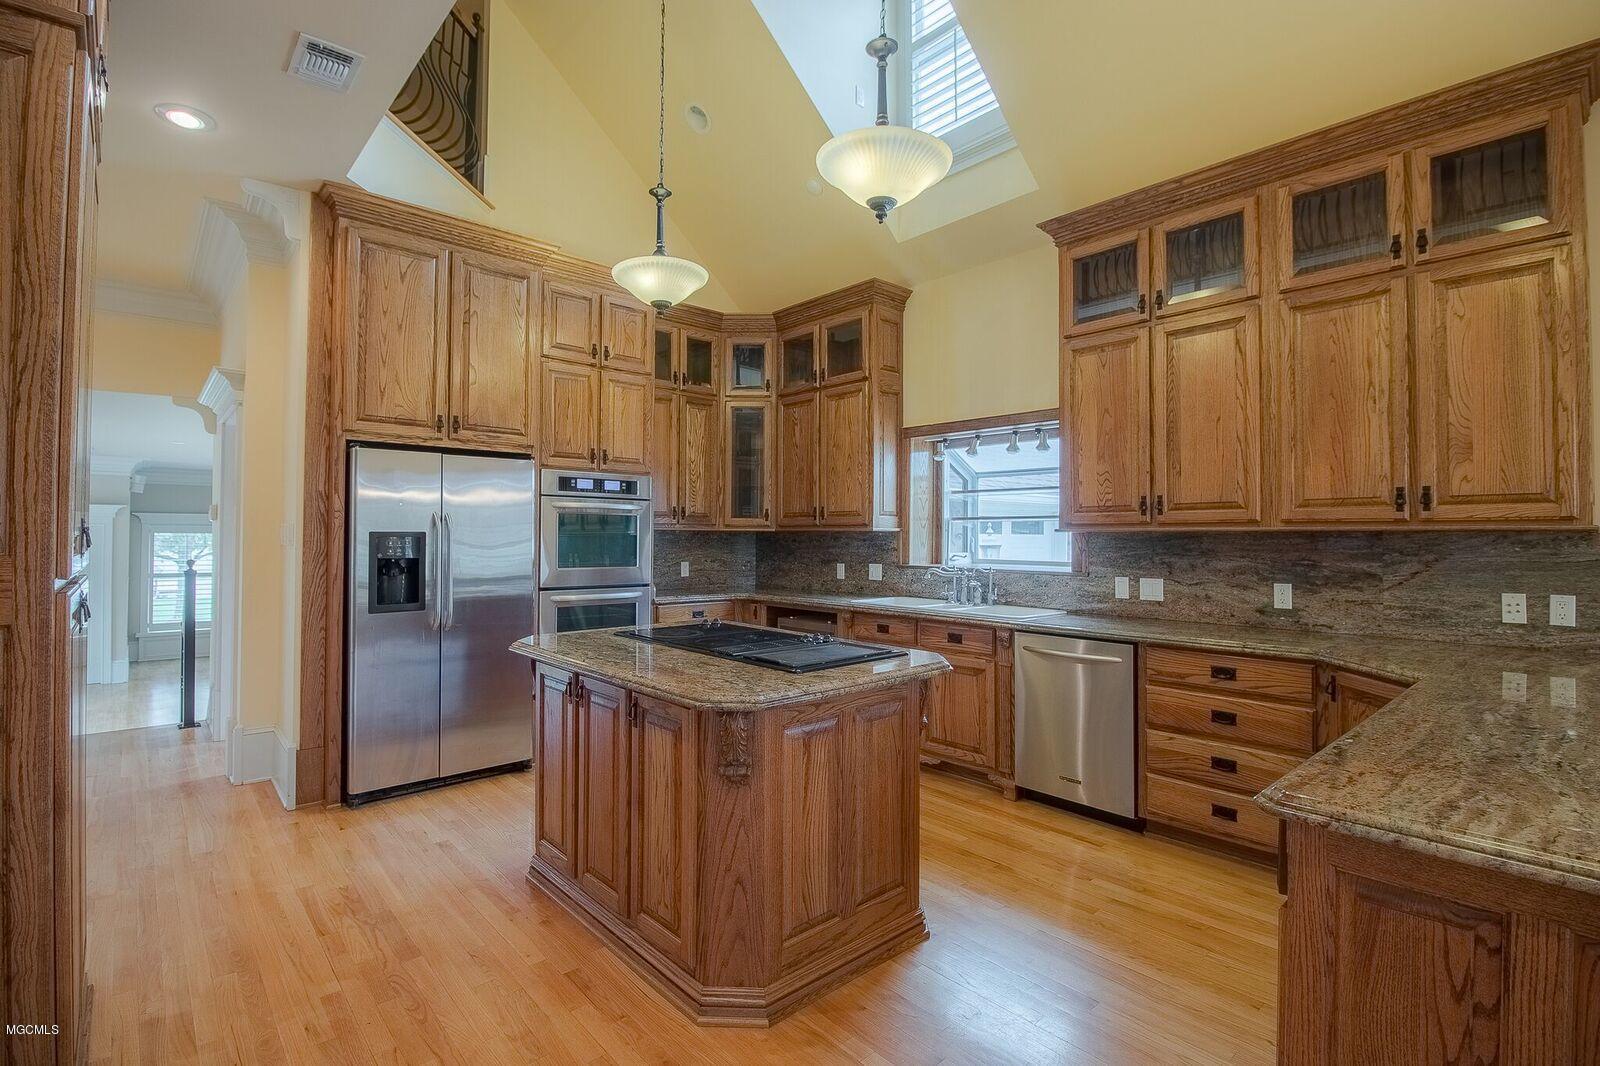 15111 Dawnland Dr, Gulfport, Mississippi 39503, 5 Bedrooms Bedrooms, ,3 BathroomsBathrooms,Single-family,For Sale,Dawnland,340871